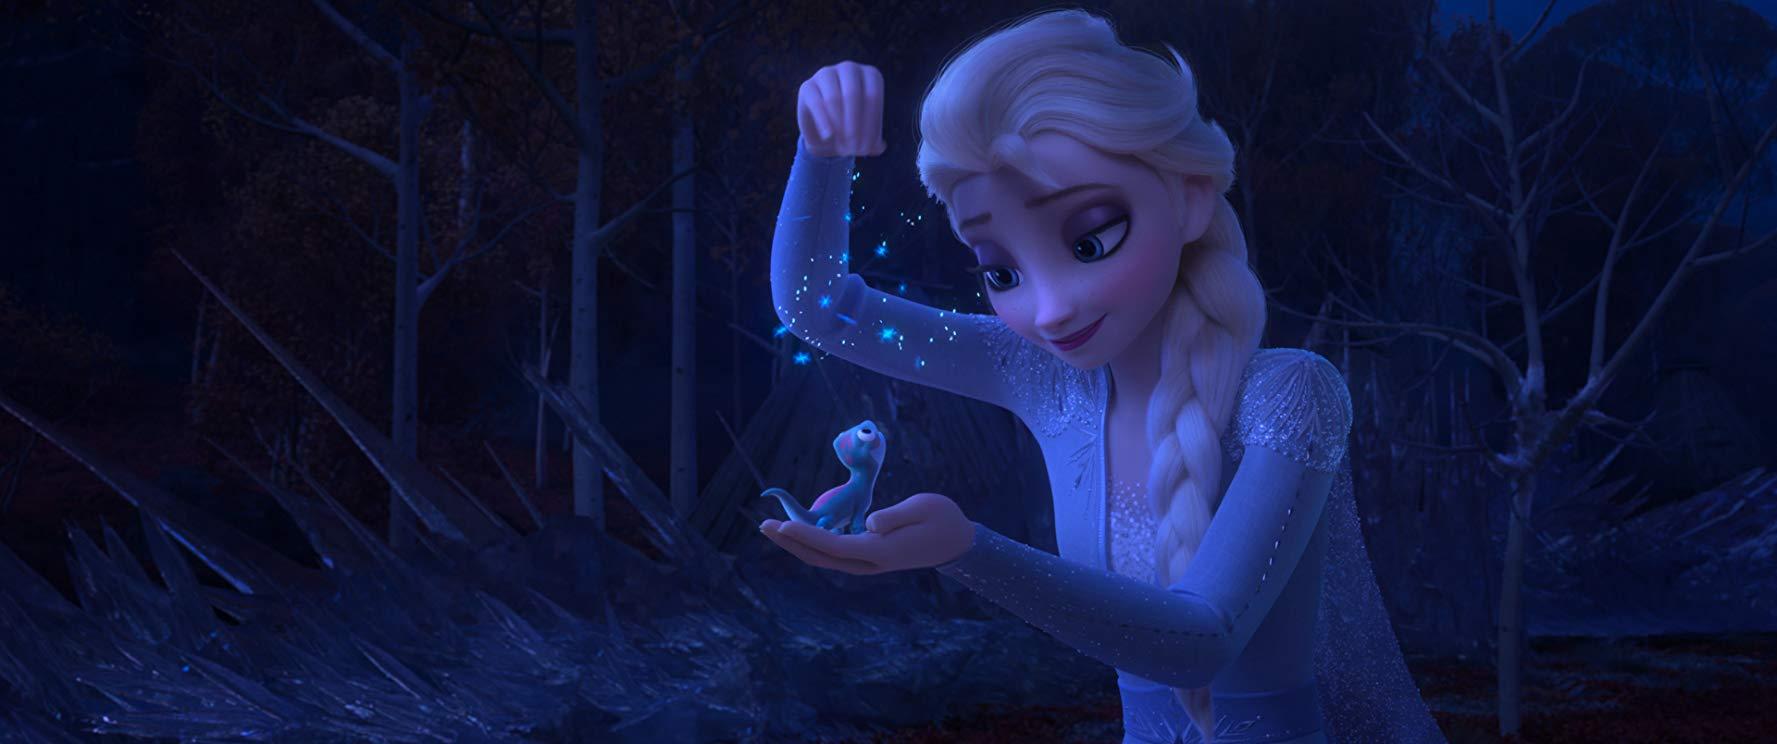 frozen2-review1.jpg